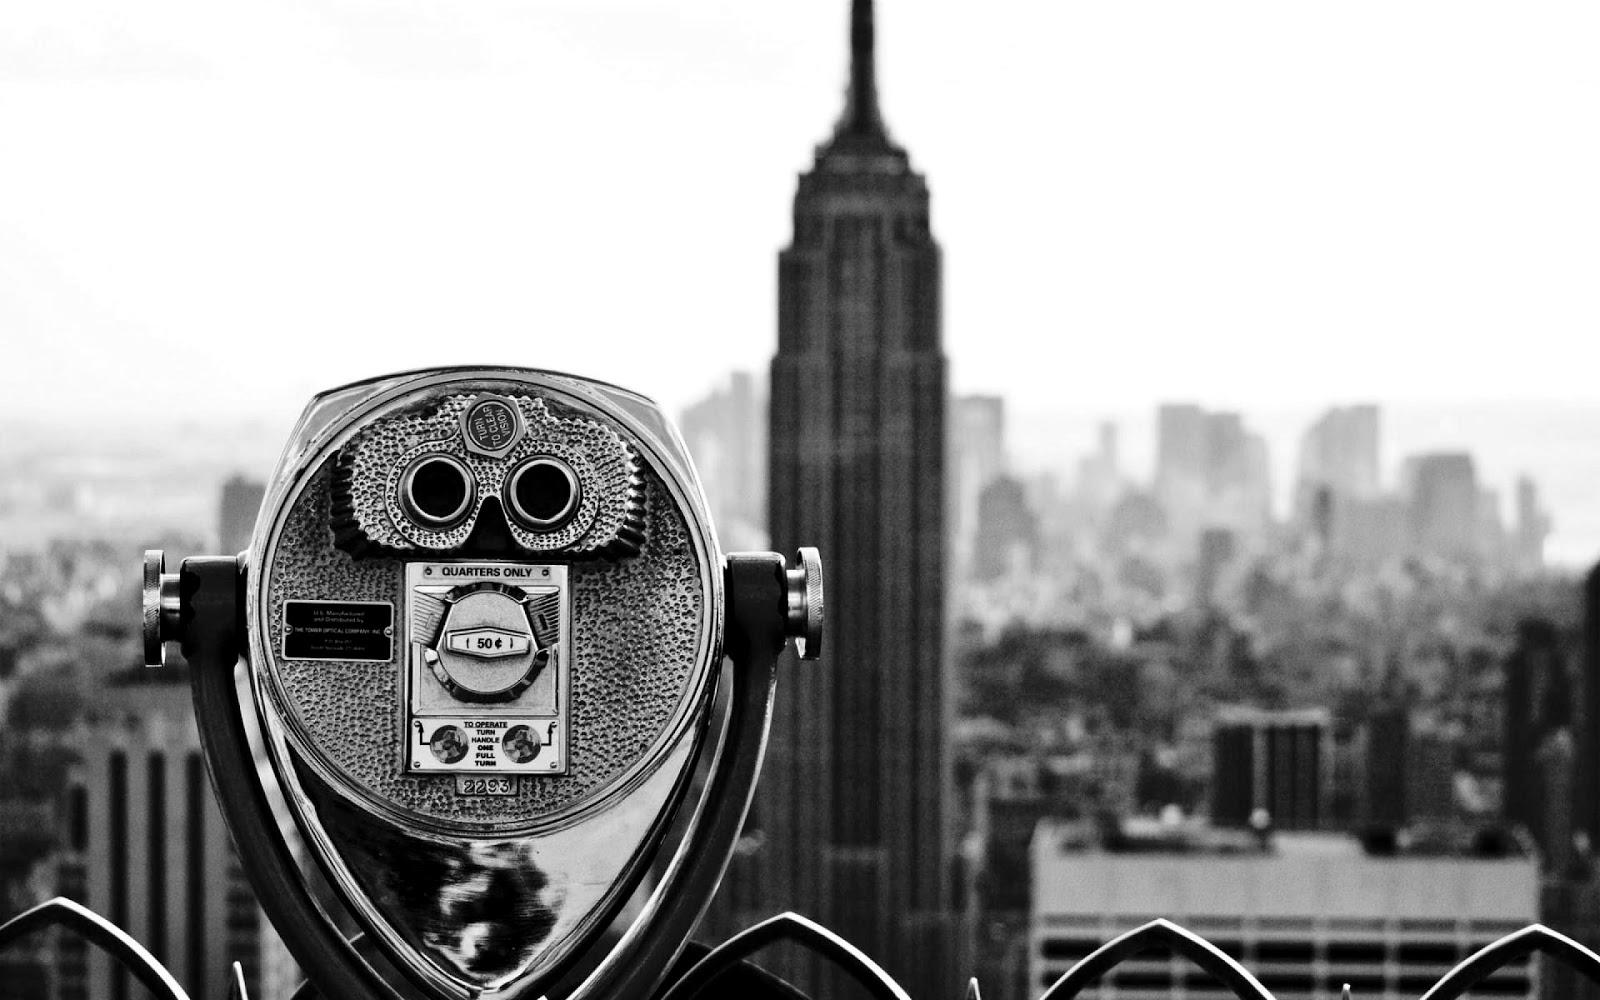 new york city buliding black and white photography 0cjpg 1600x1000